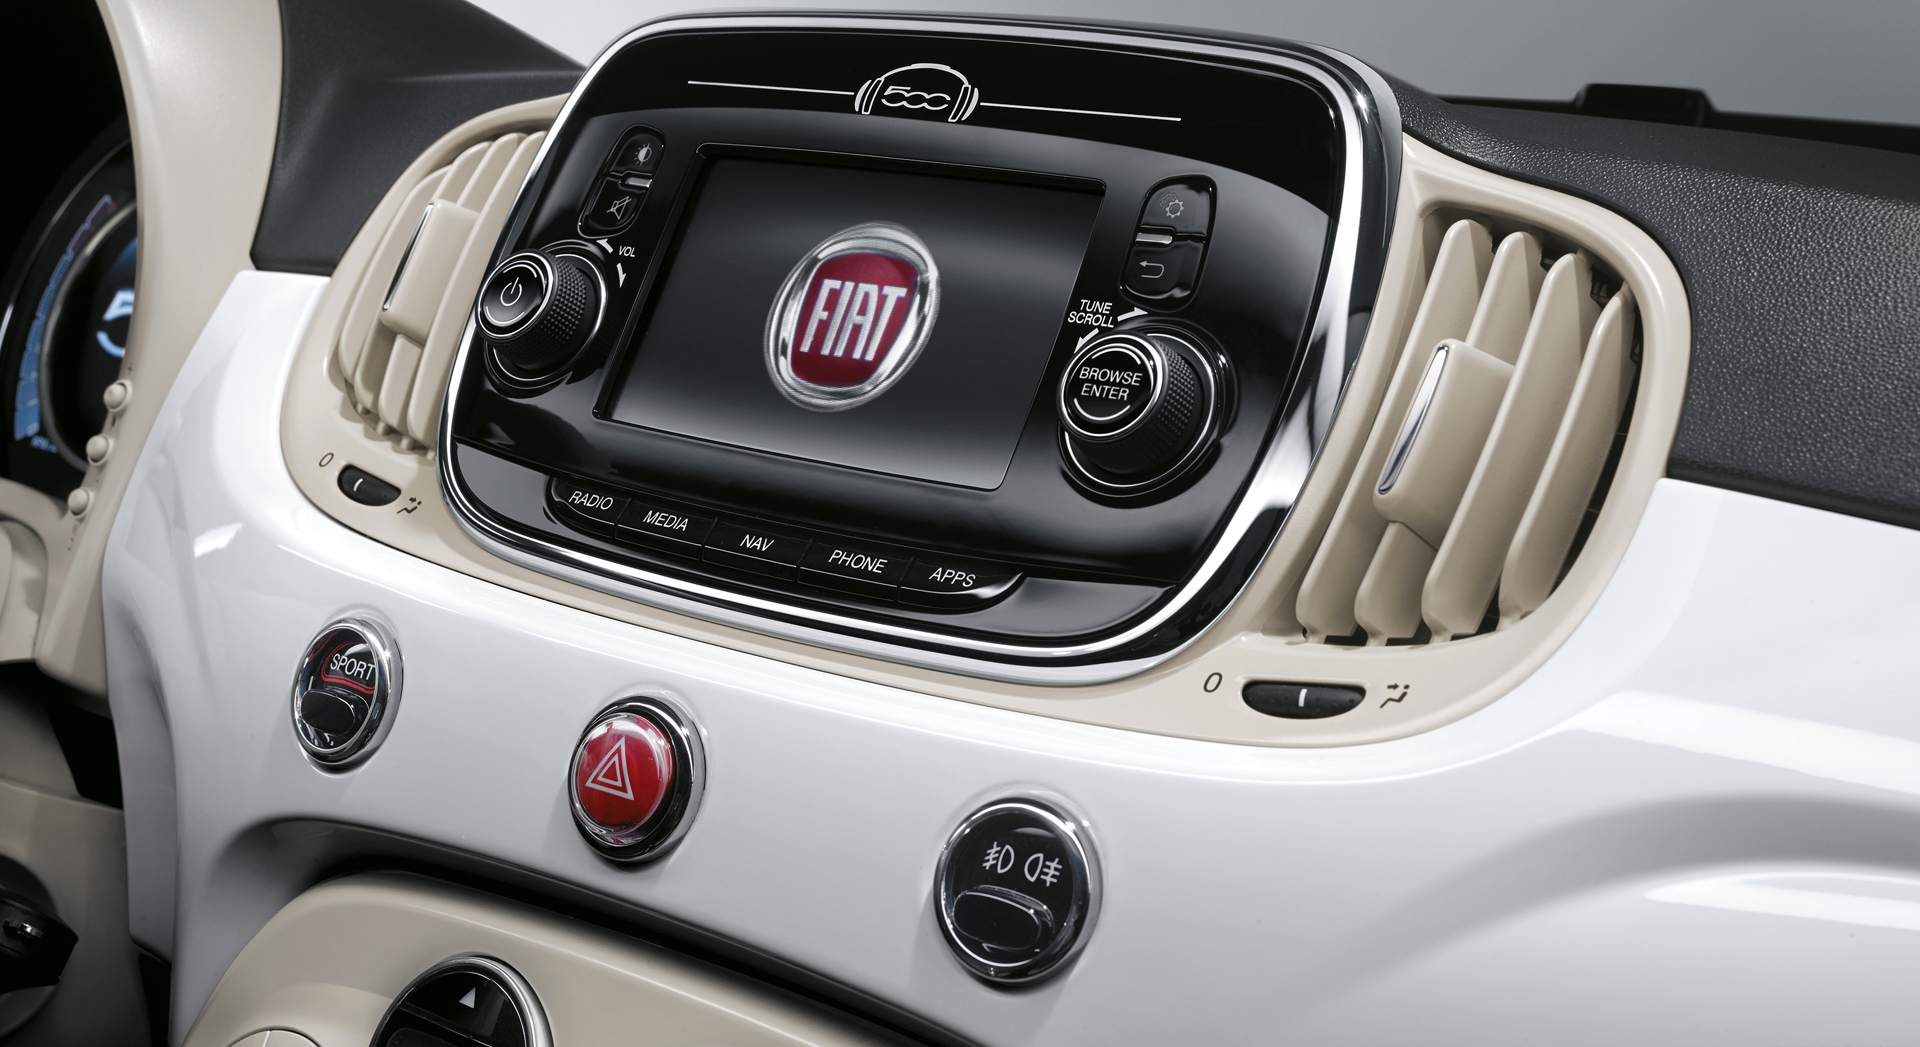 434b131e 0956 4d9a b268 7d290fa415f5 فیات ۵۰۰ مشخصات فنی، قیمت و هر آنچه درباره آن باید بدانید   اجاره ماشین